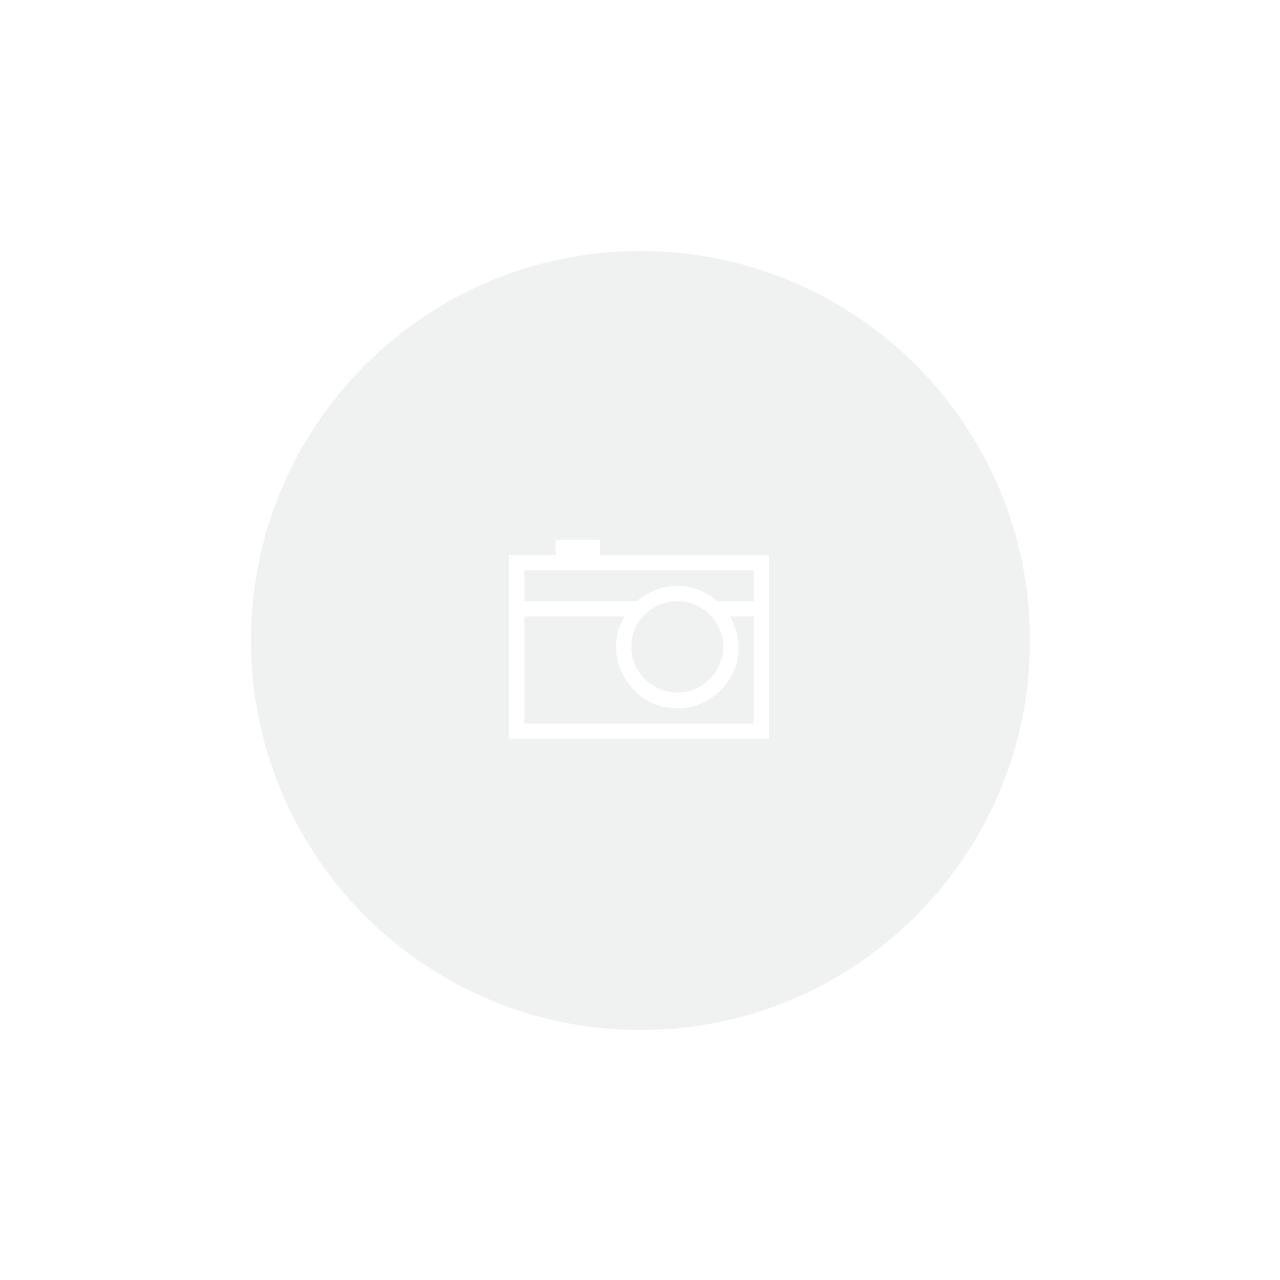 BICICLETA SPEED BMC SLR03 ONE 2019 22V SHINANO 105